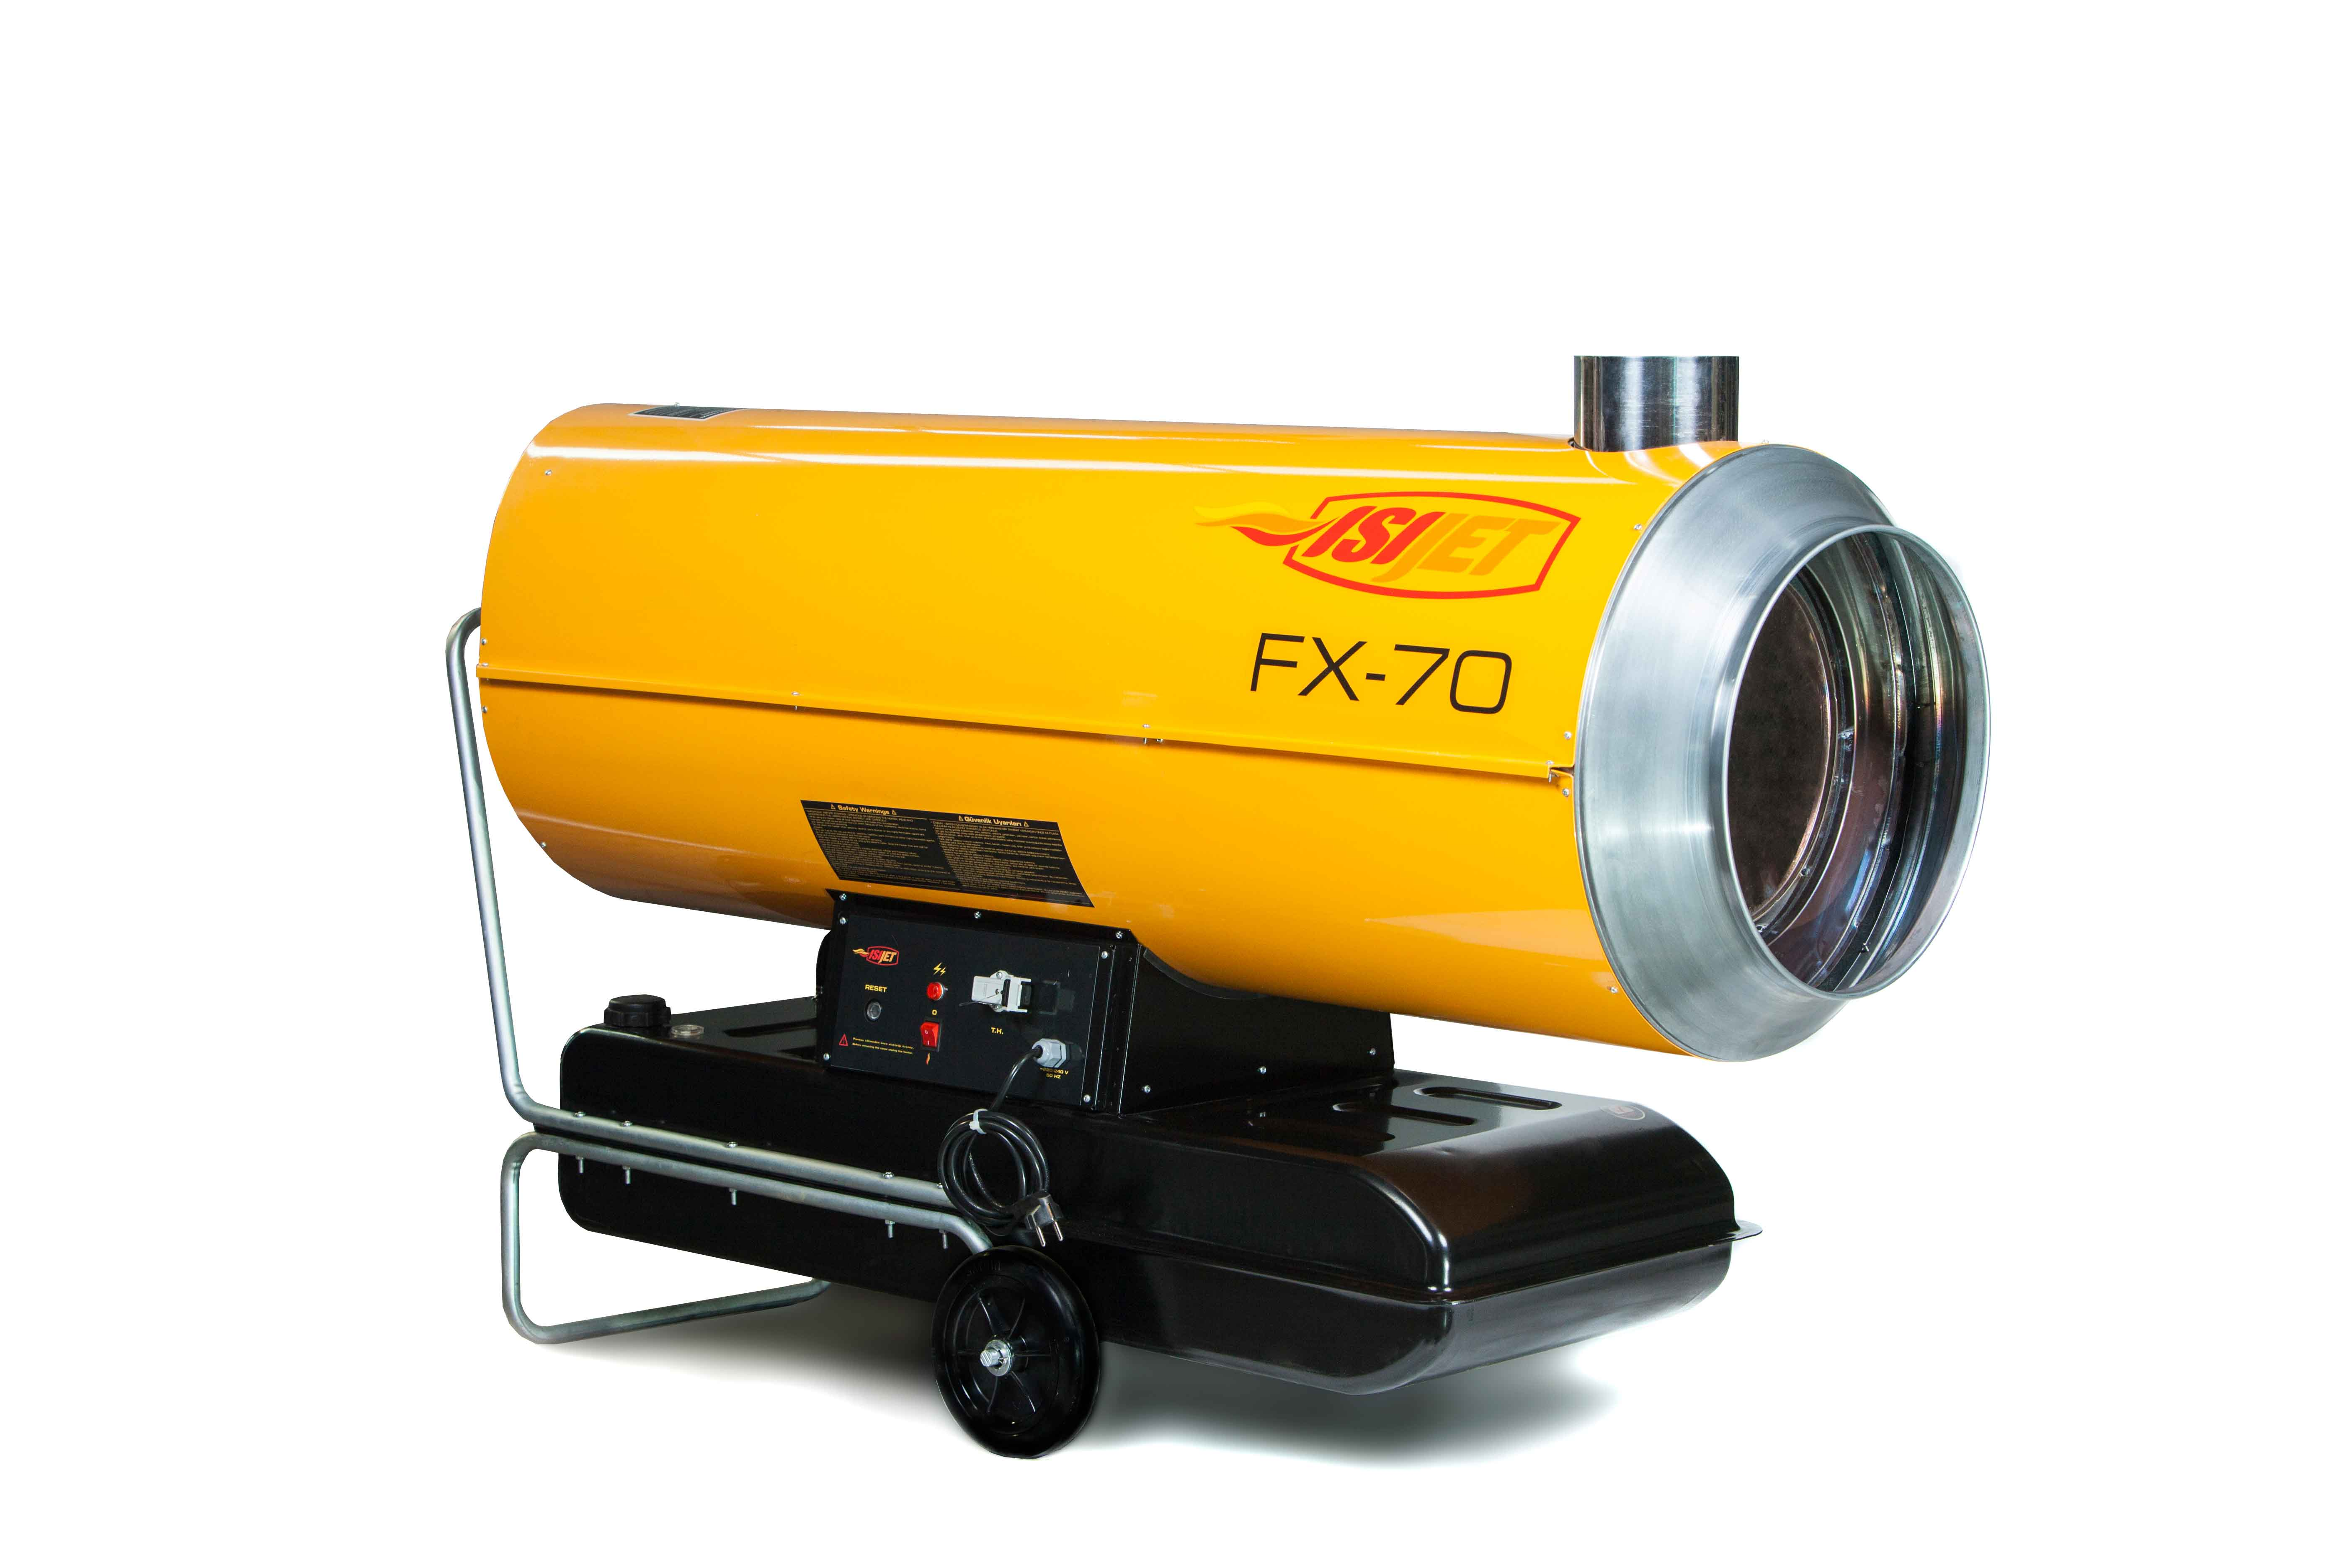 FX-70